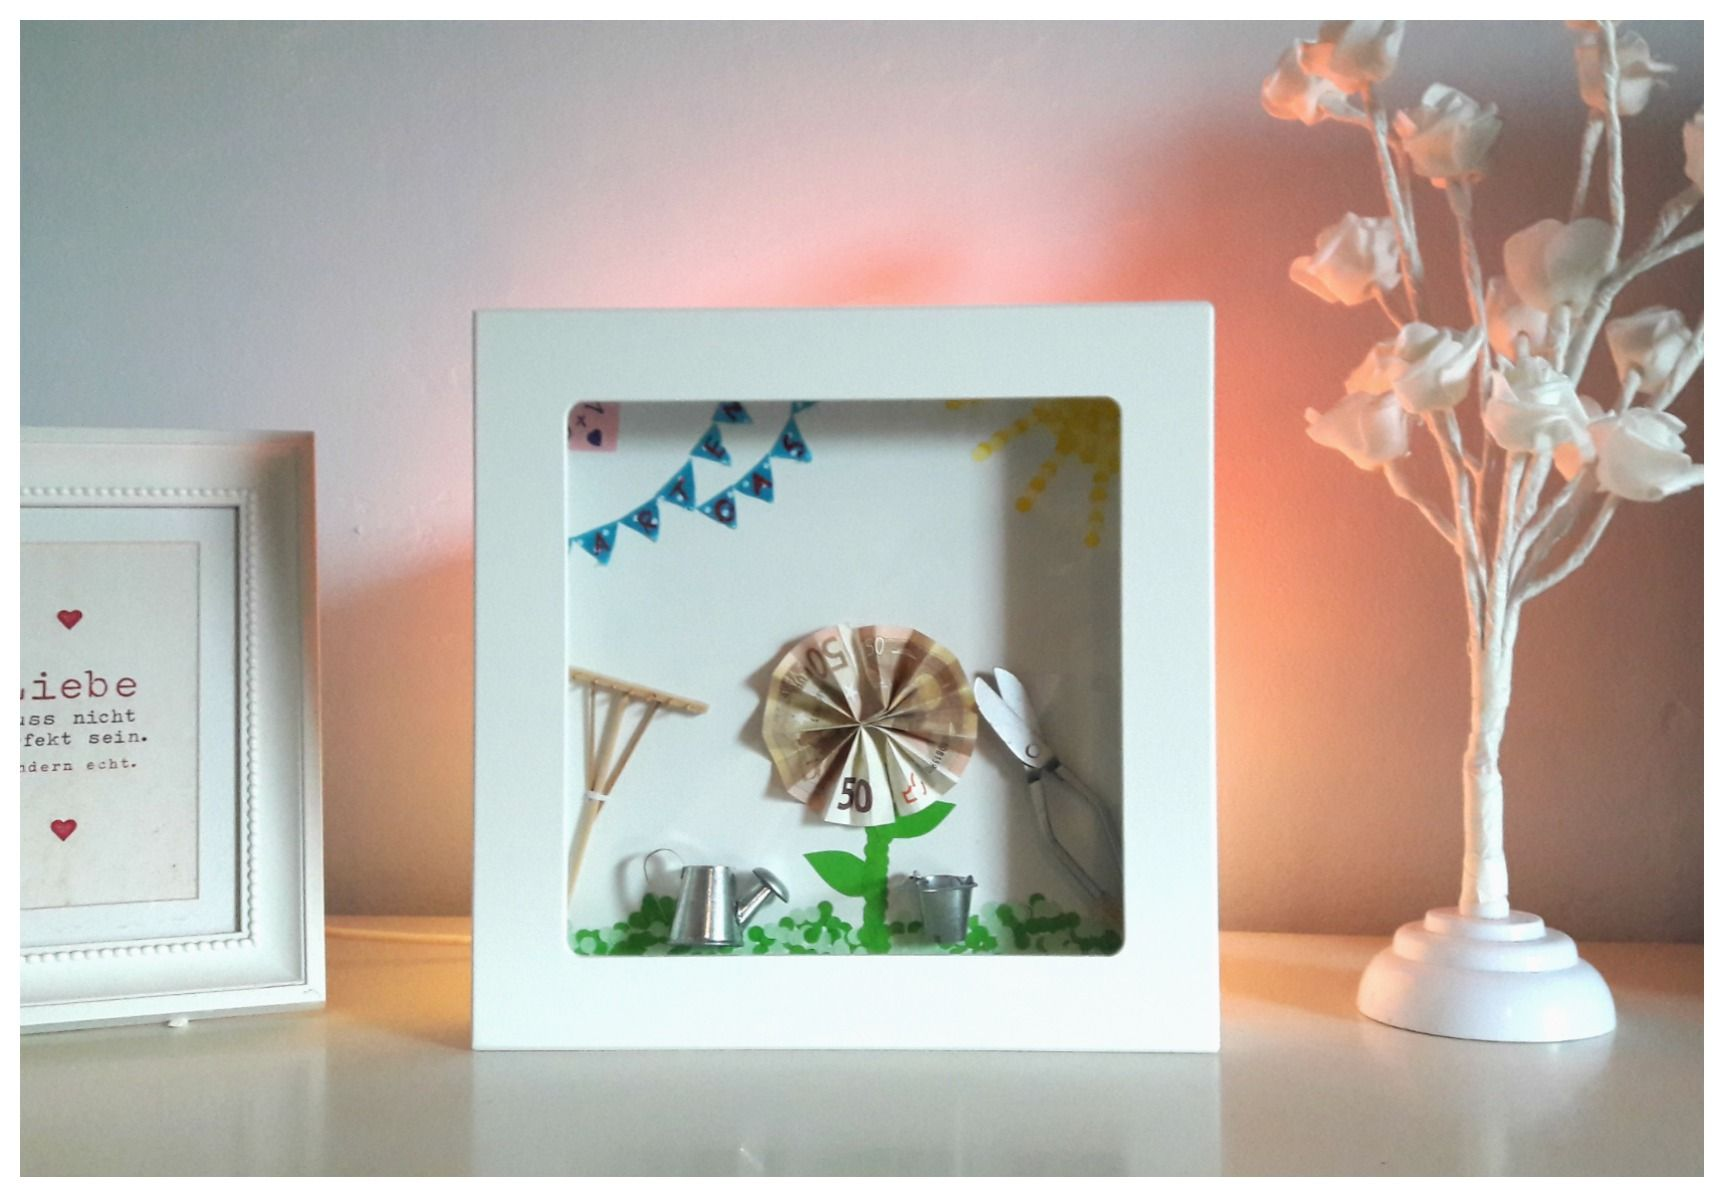 3D-Bilderrahmen - Spardose zum Selbergestalten | Pinterest ...